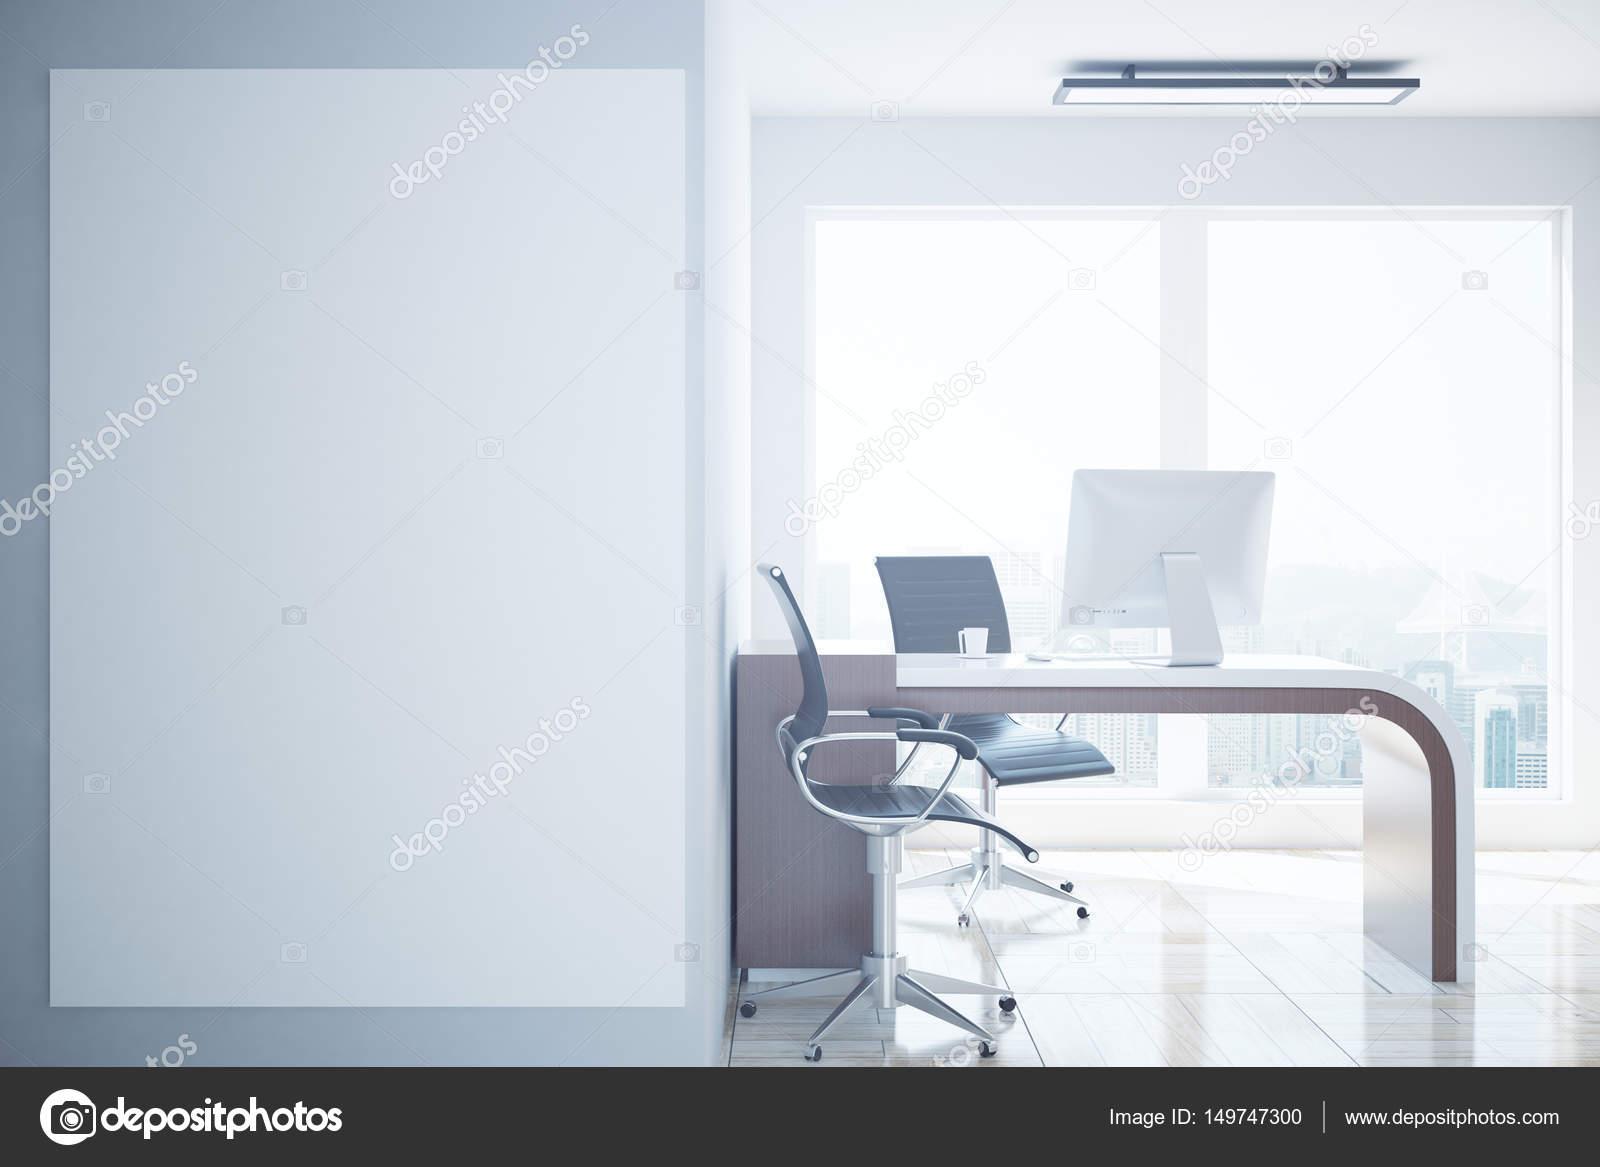 Tableau Blanc Bureau : Bureau avec tableau blanc blanc u photographie peshkova